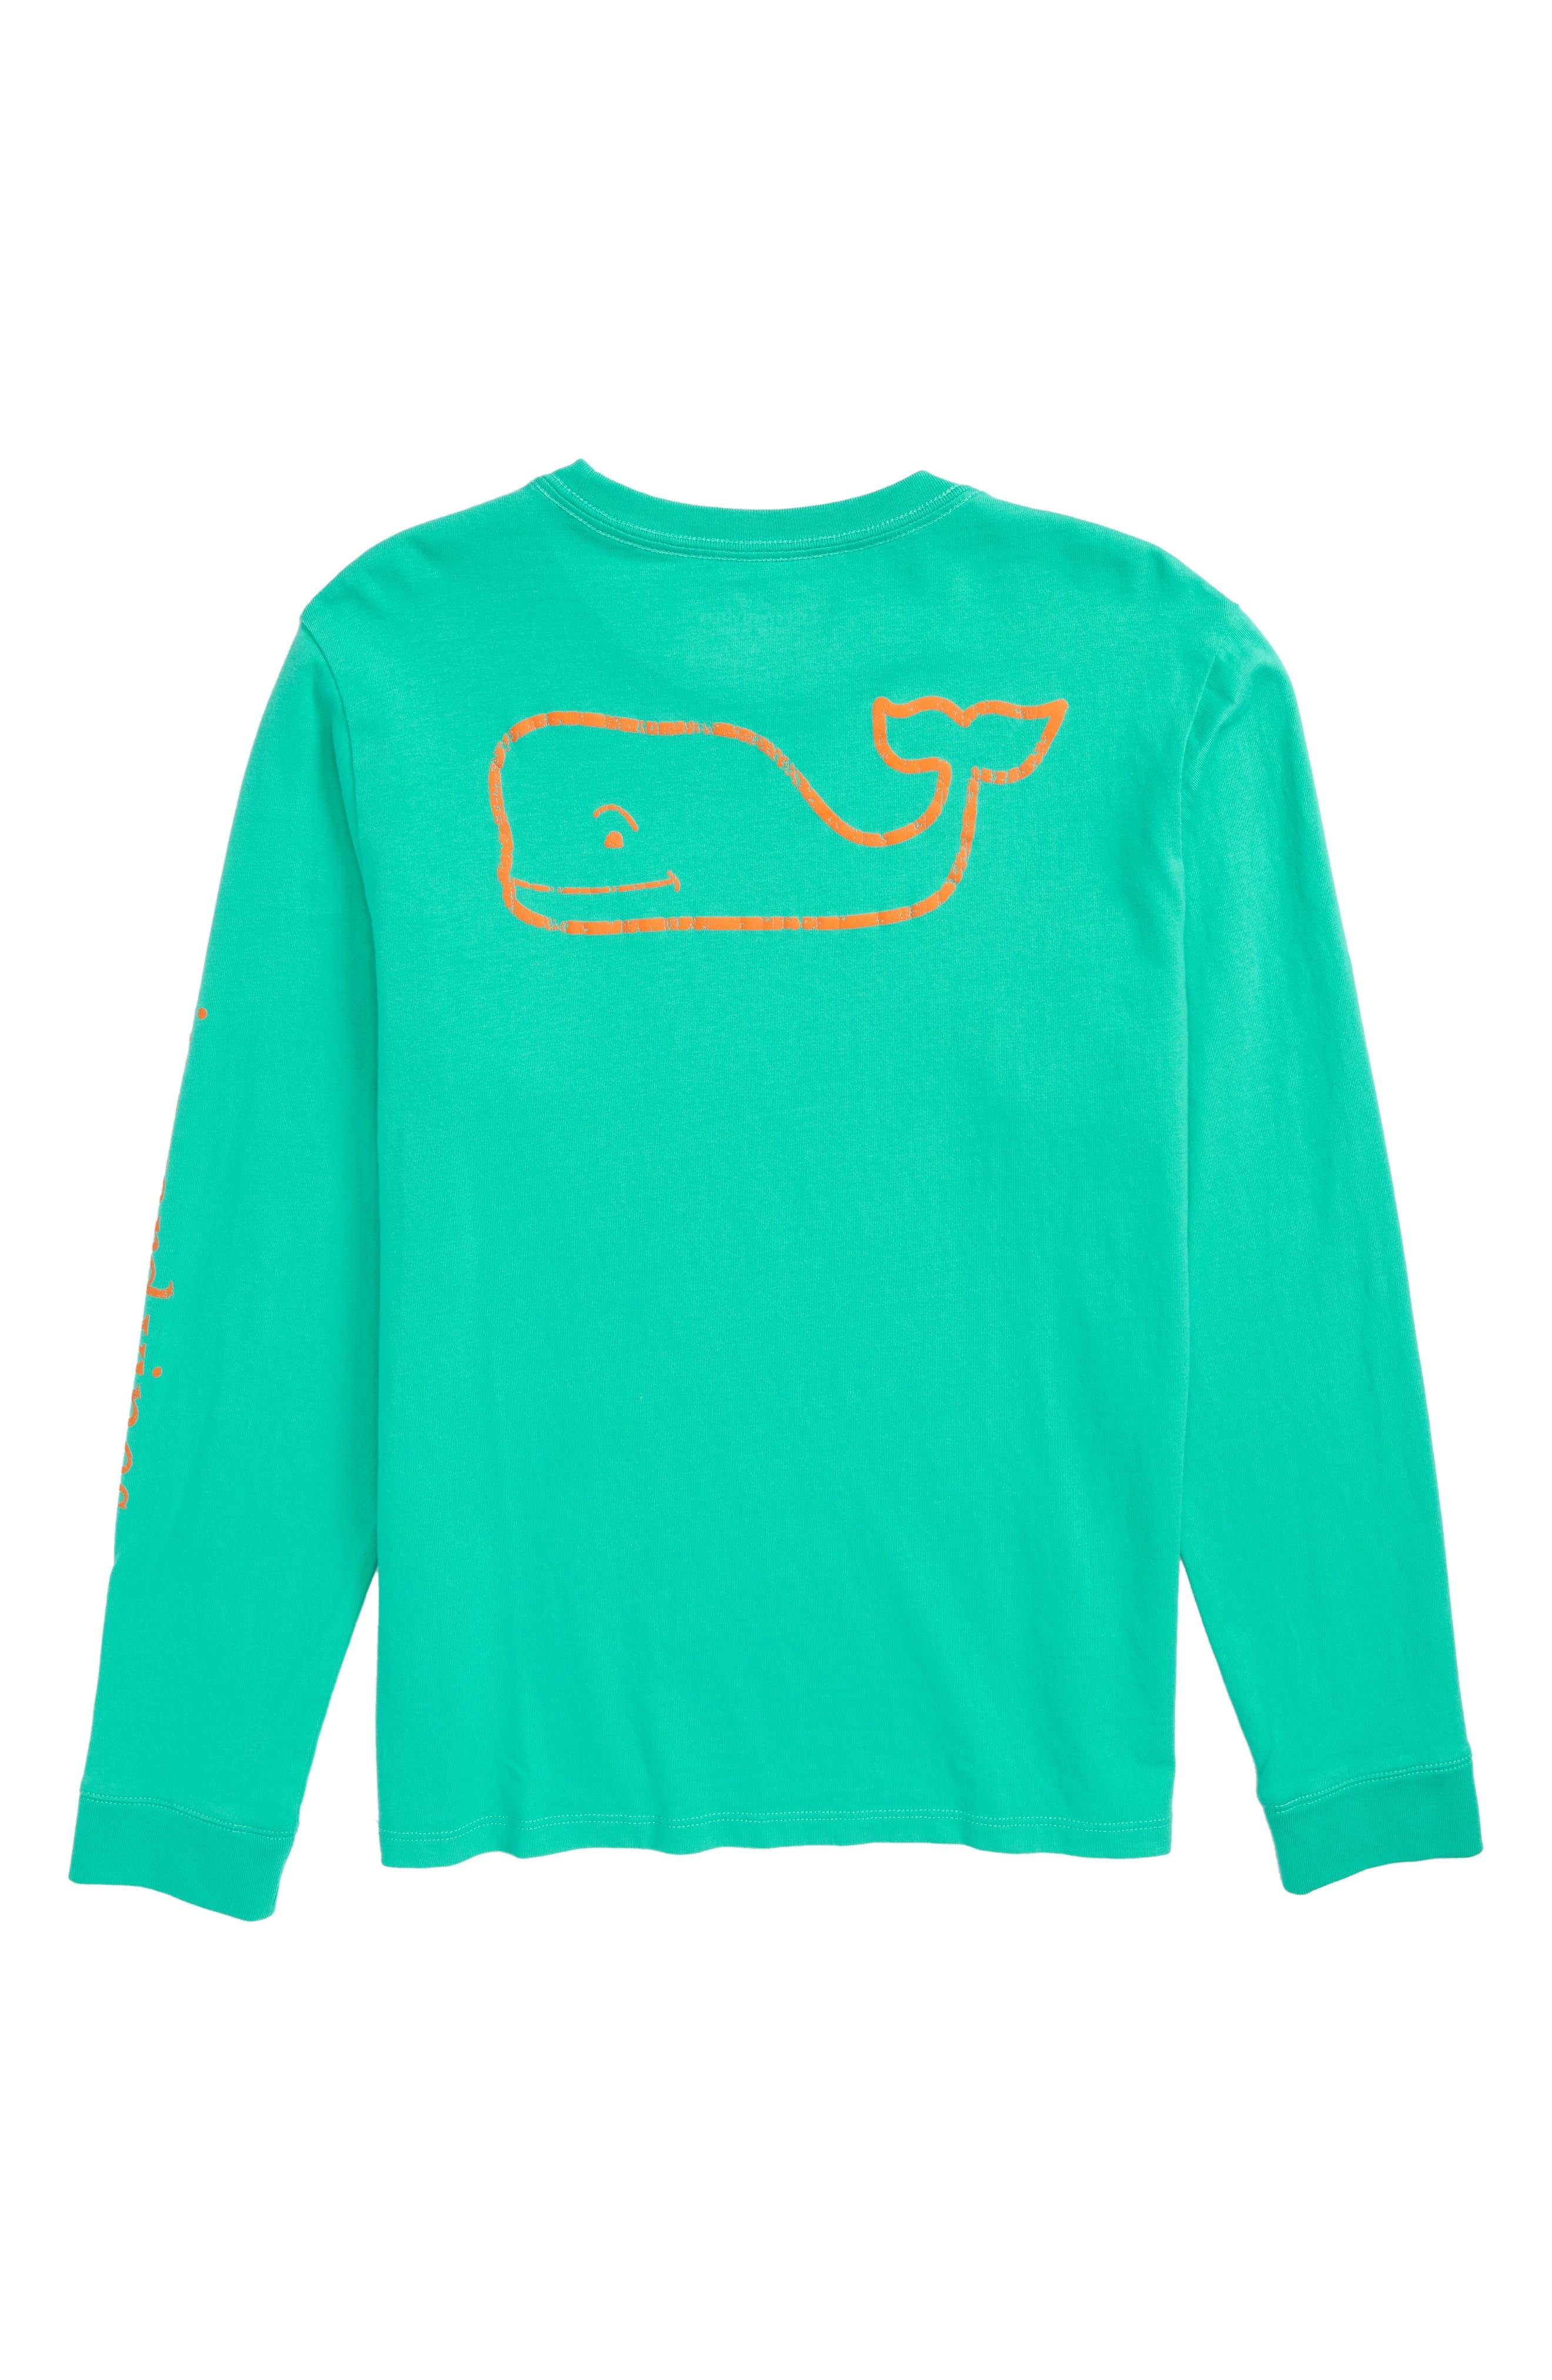 Vintage Whale Graphic Long Sleeve T-Shirt,                             Alternate thumbnail 2, color,                             386